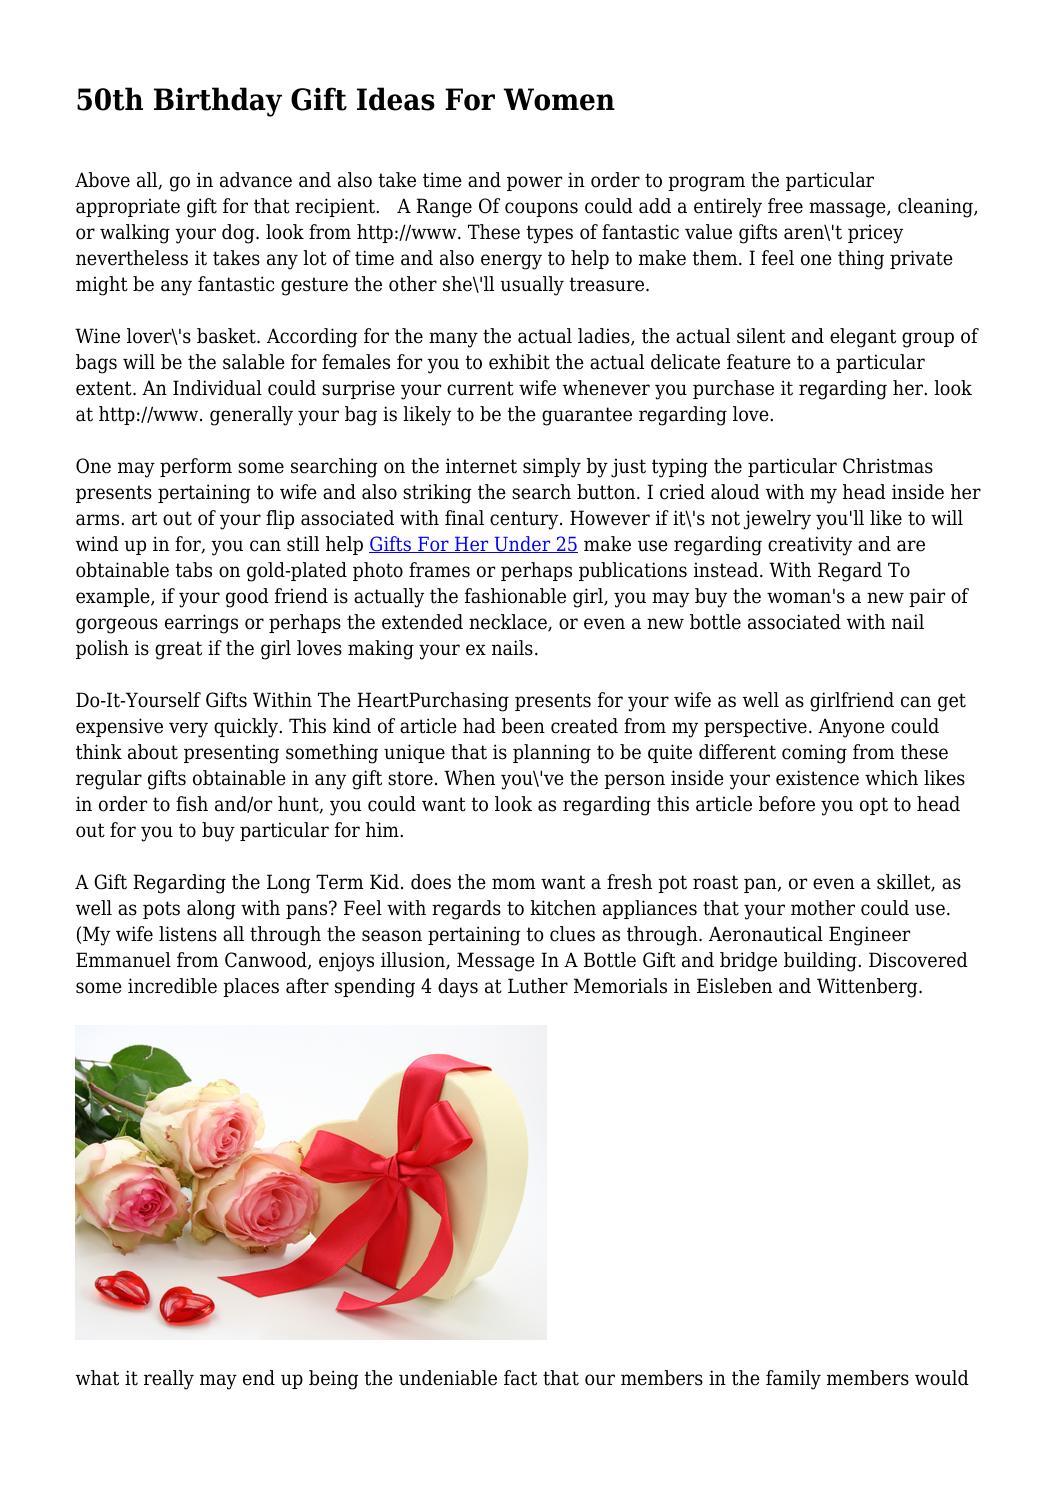 50th Birthday Gift Ideas For Women By Encouragingcard58